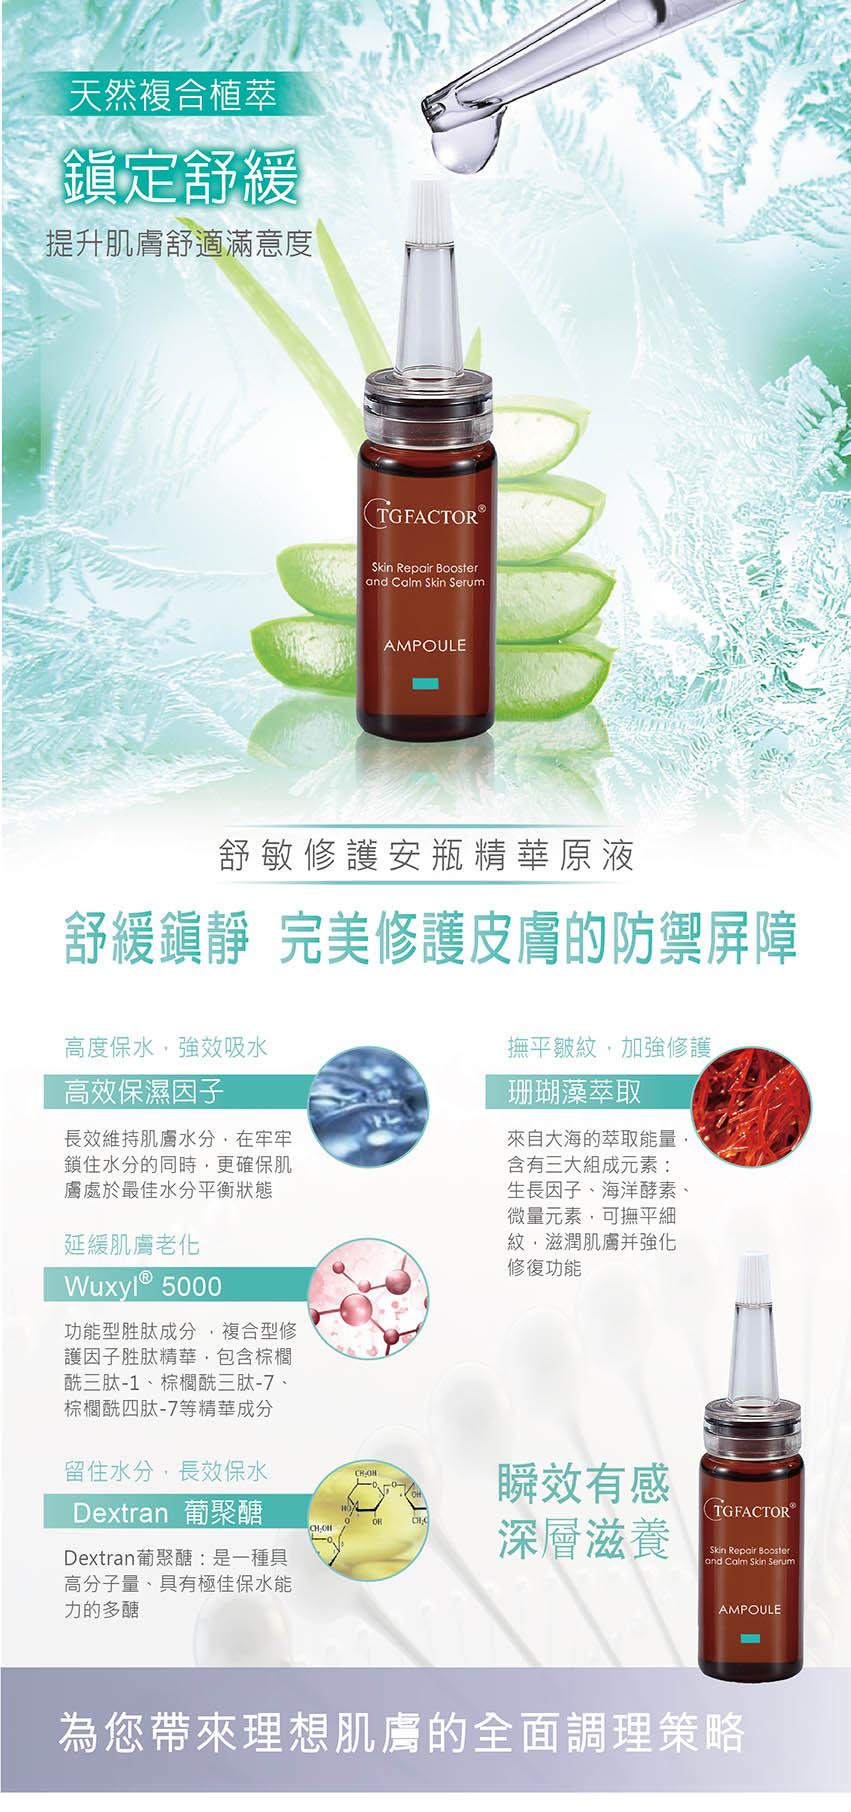 TG Factor, 水晶潔膚液, 深層保濕修護霜, 舒敏修護安瓶原液, 卸妝, 洗臉, 修護, 乳霜, 安瓶, 原液, 修護安瓶, 醫美, 試用, 體驗